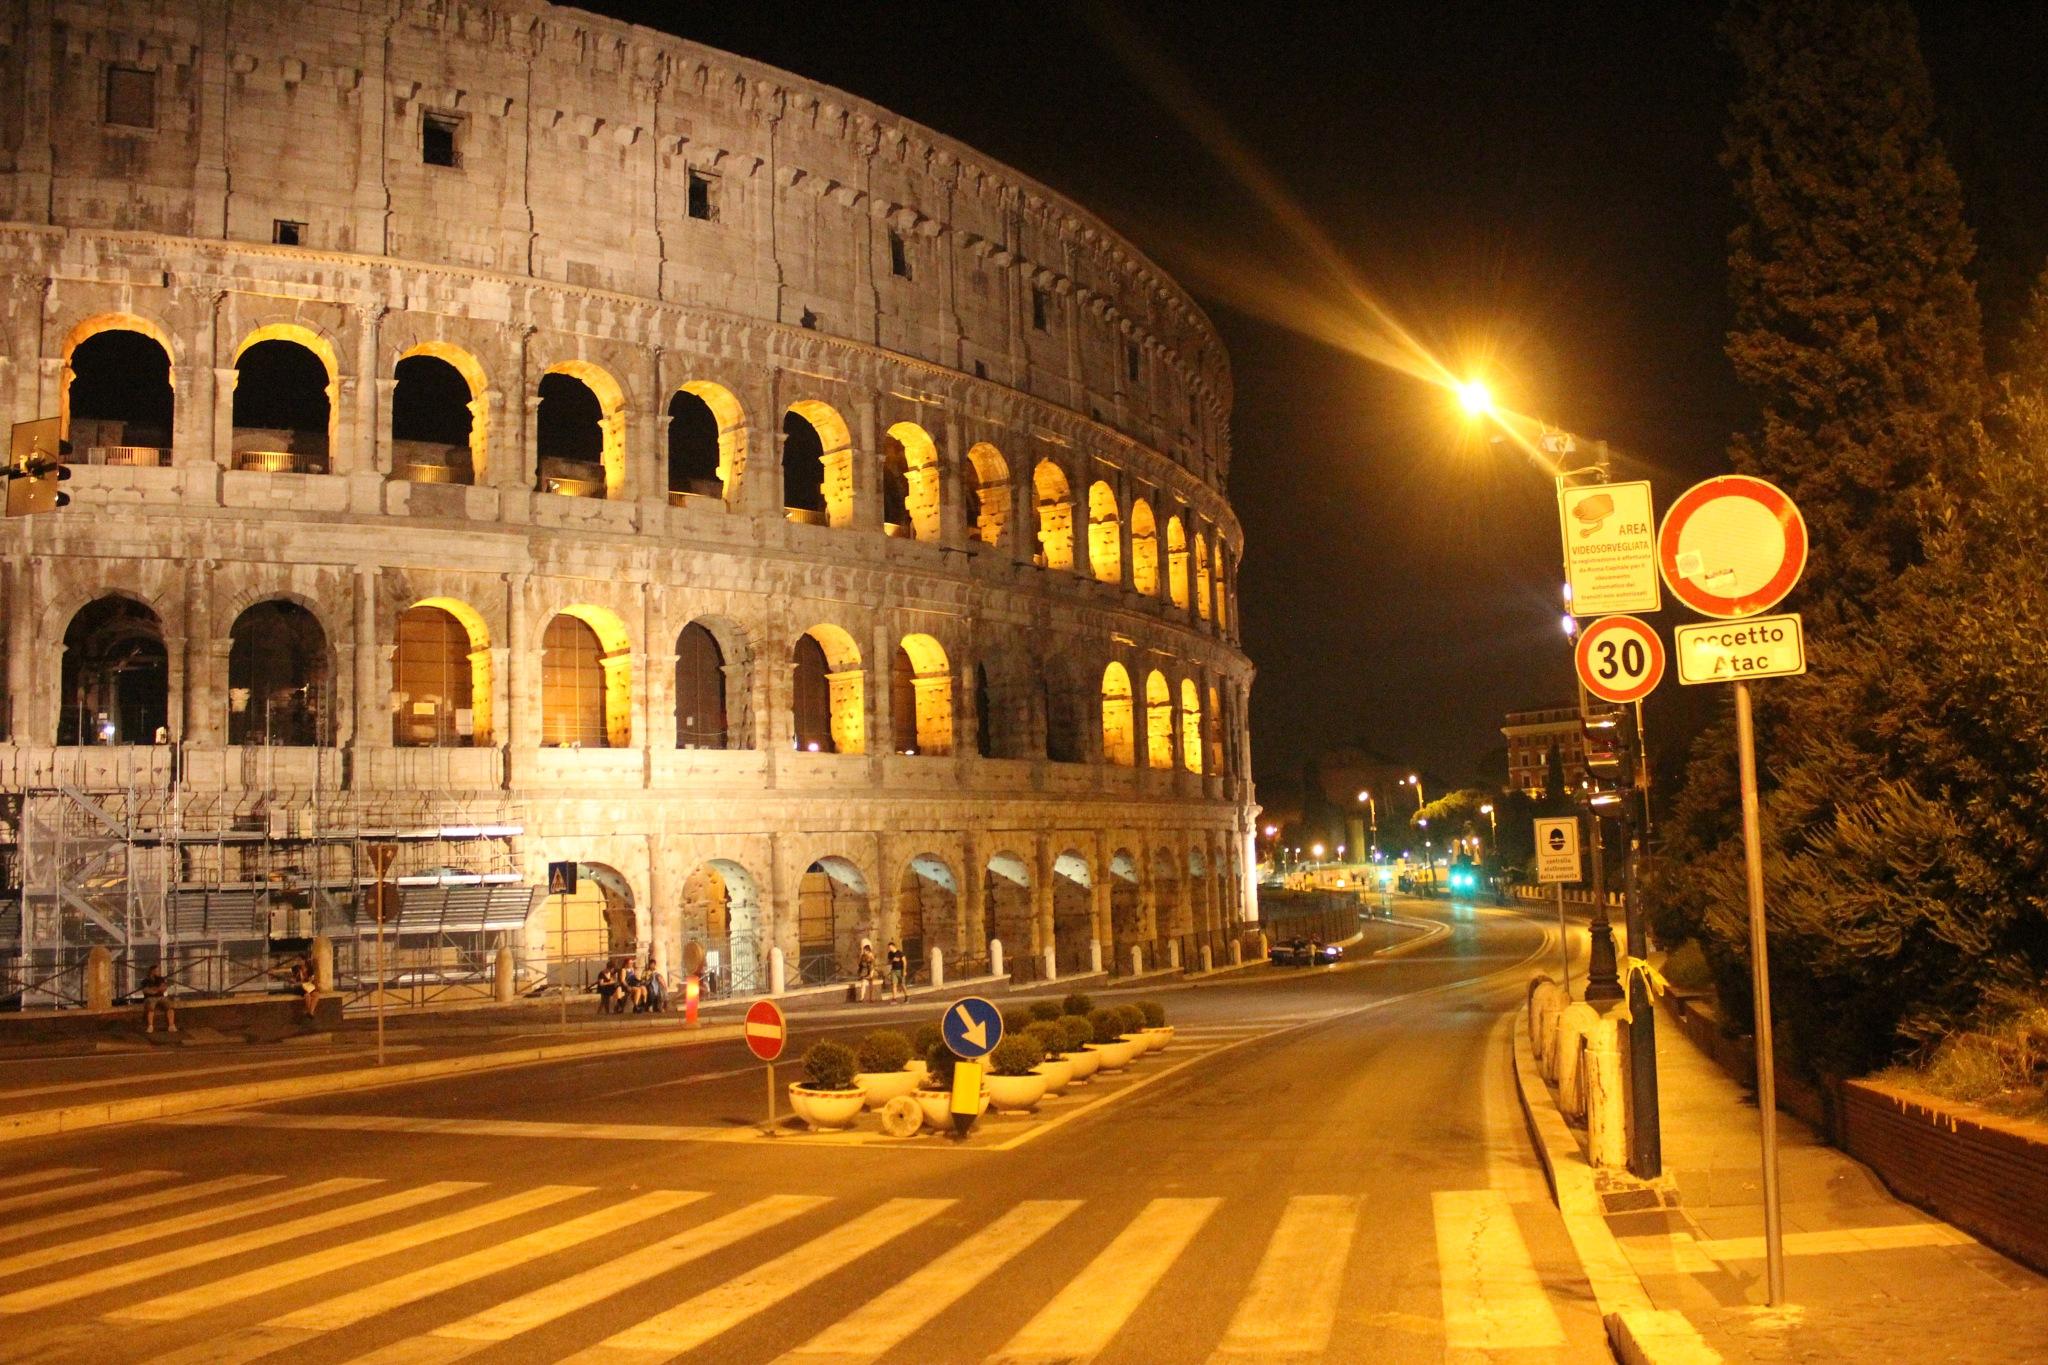 Colosseo Side by Sides by M. Aymane Zizi